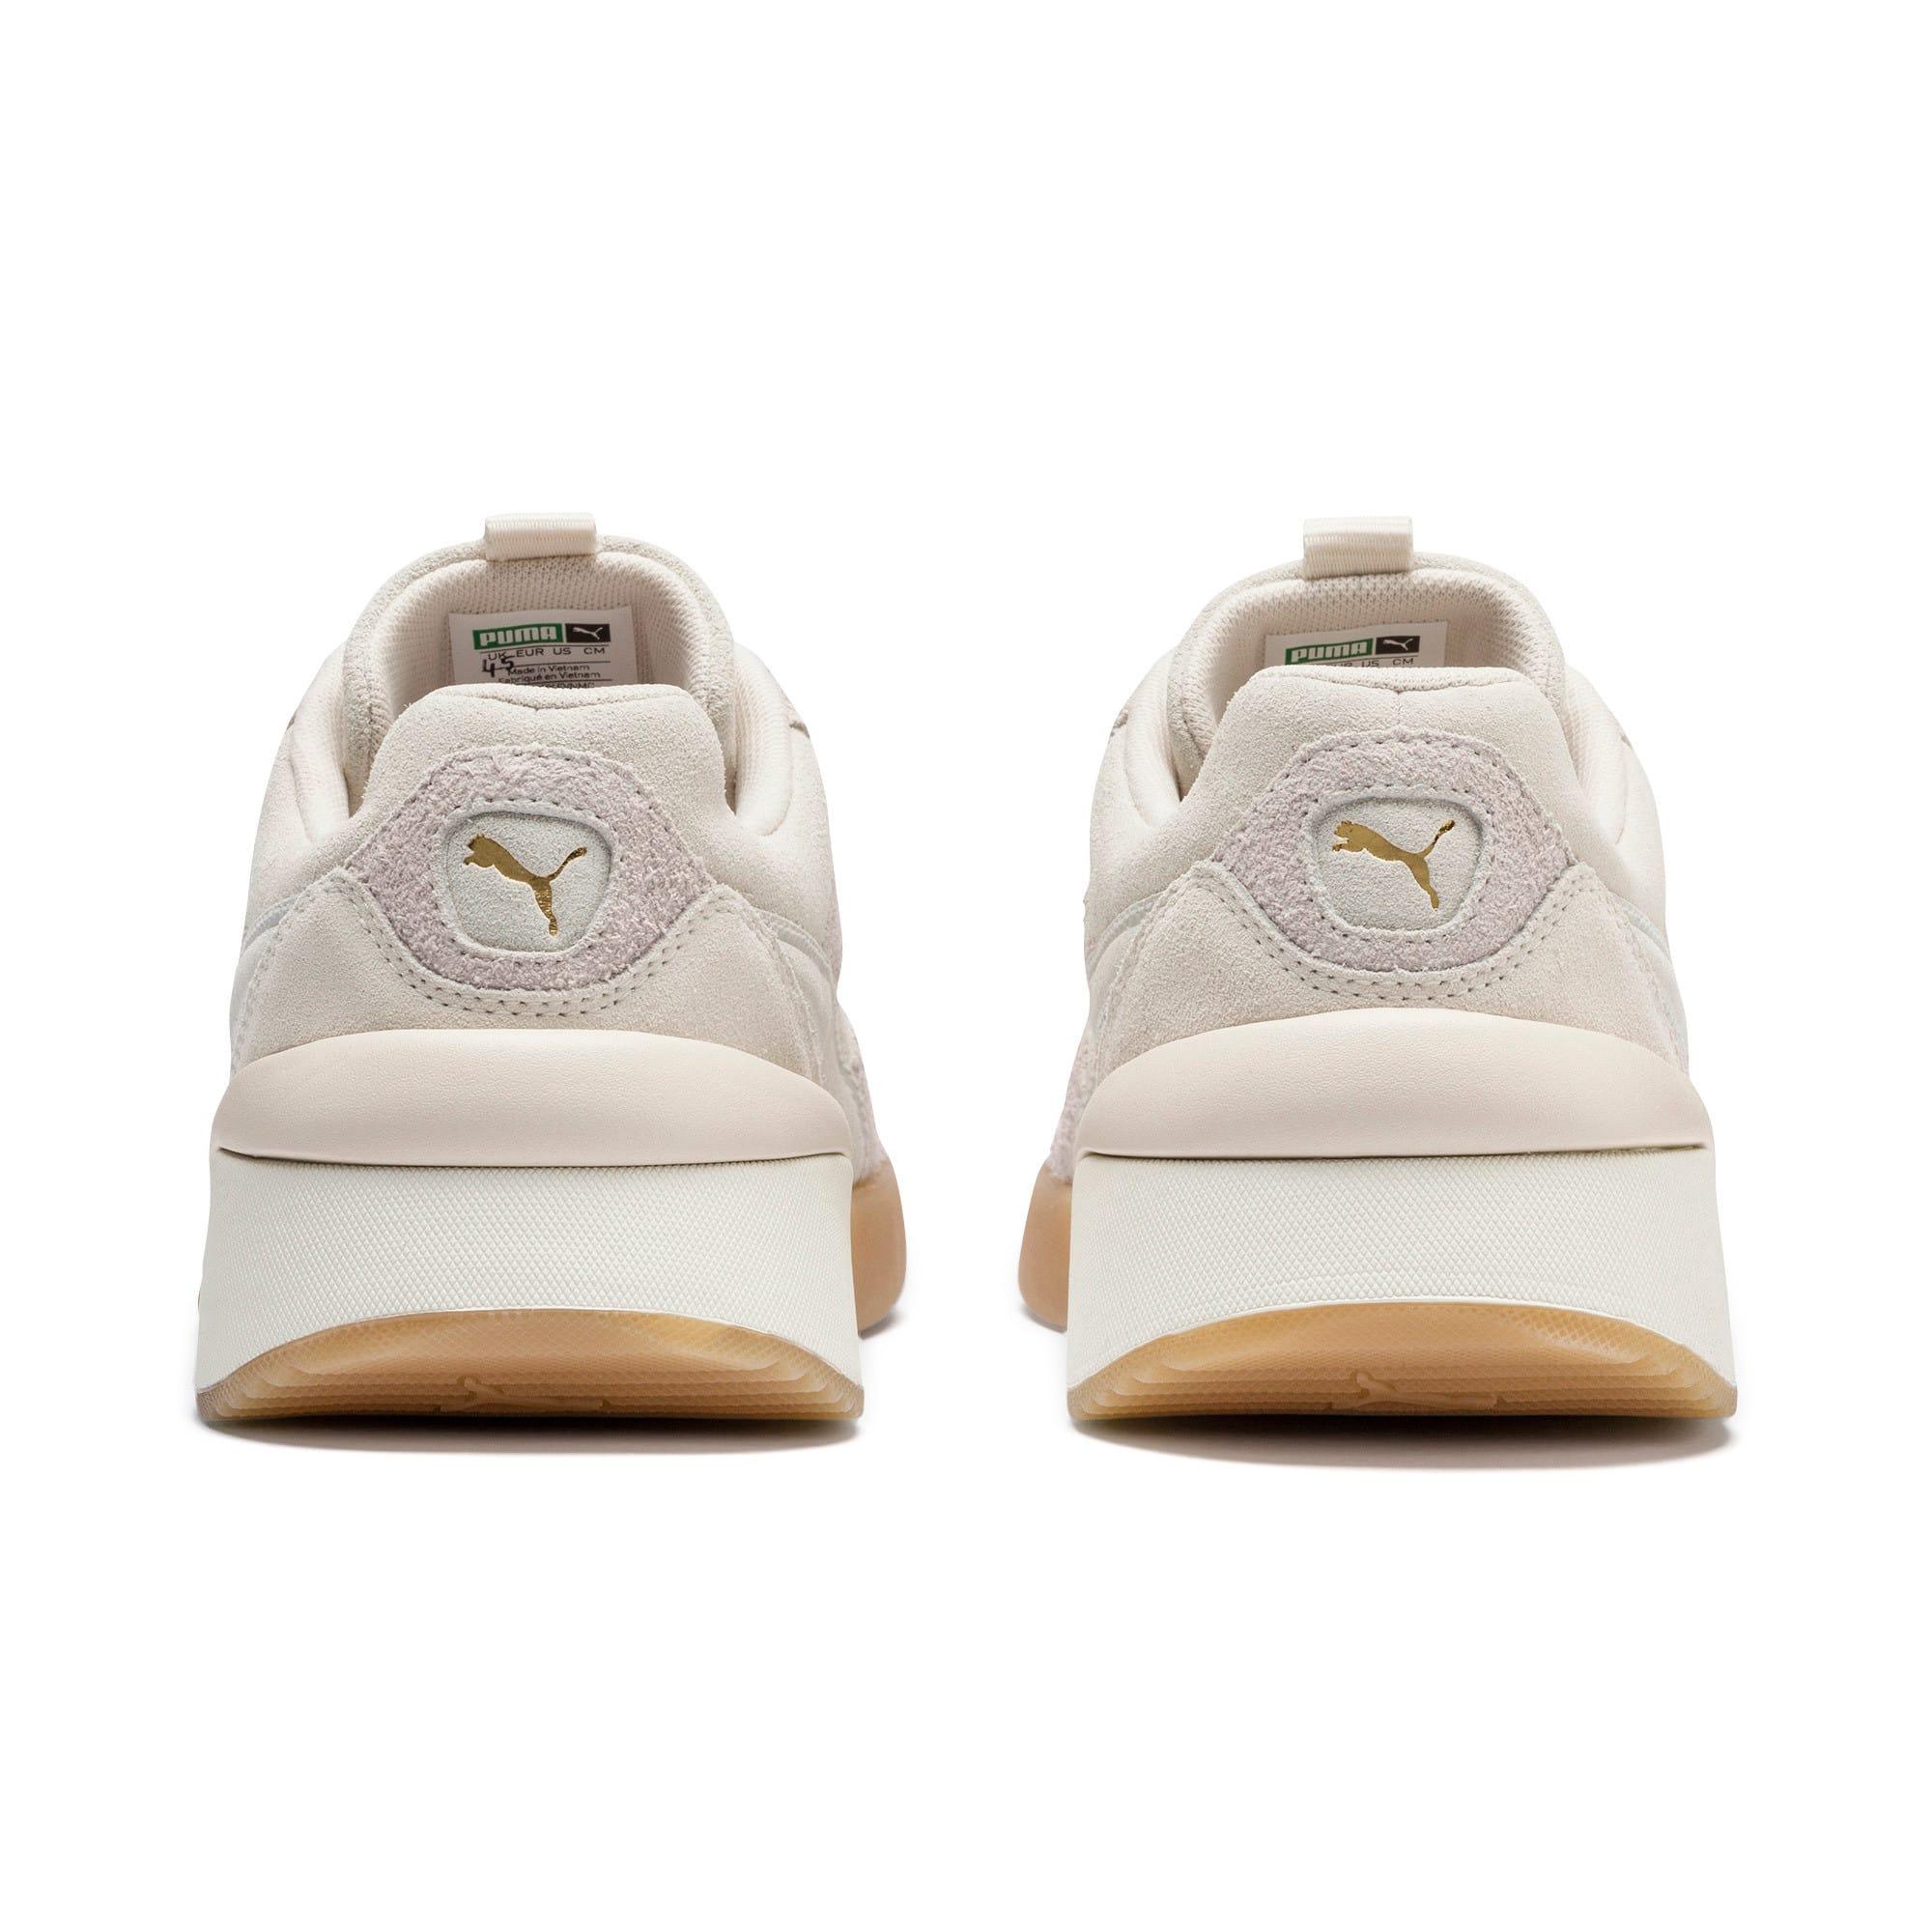 Thumbnail 4 of Aeon Rewind Women's Sneakers, Pastel Parchment, medium